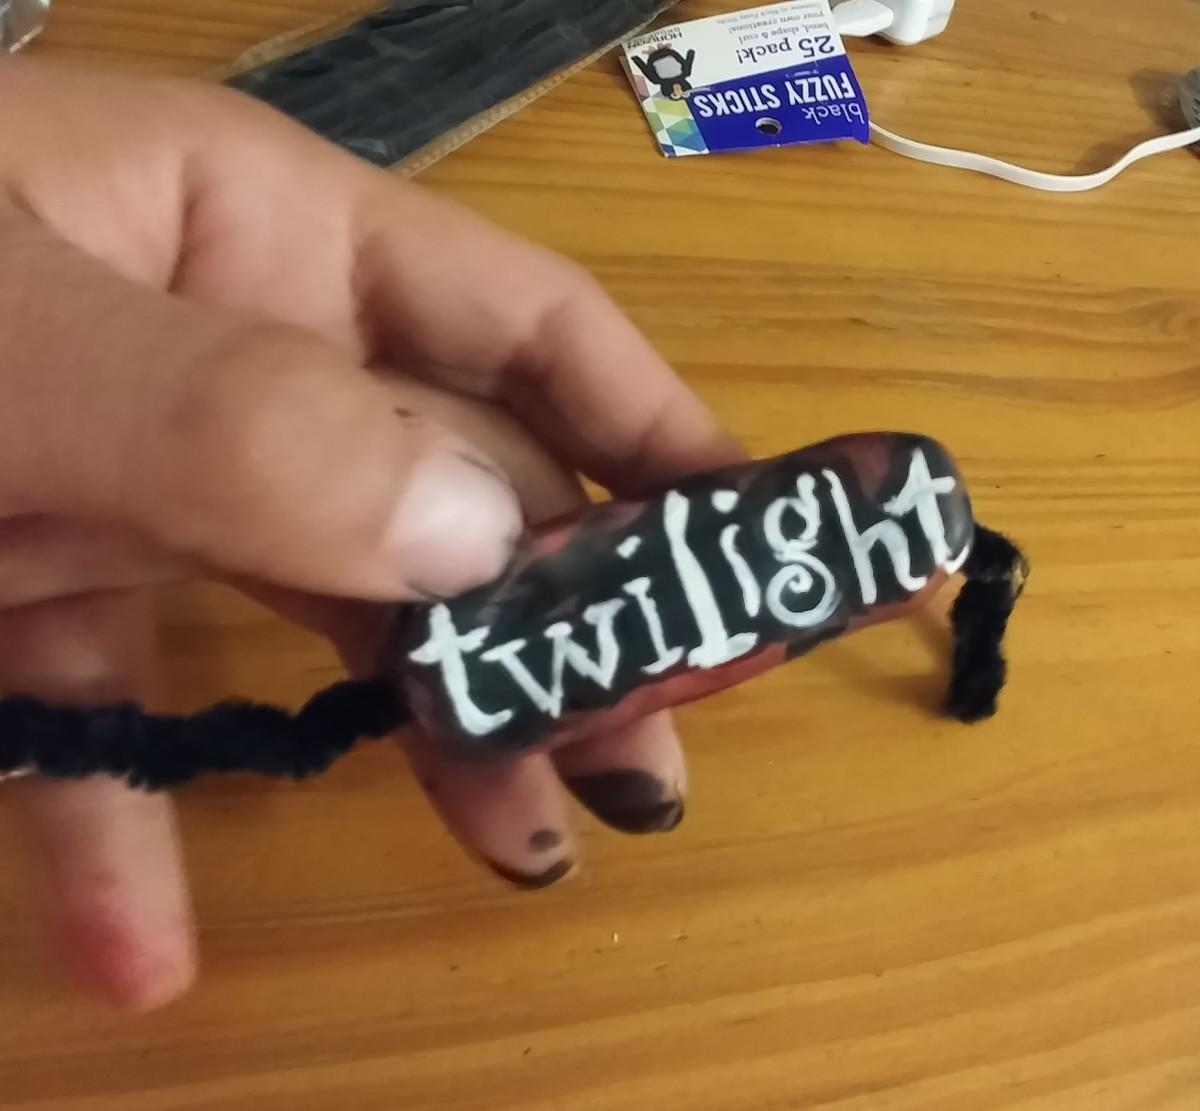 Glue the Twilight emblem onto the fuzzy sticks.